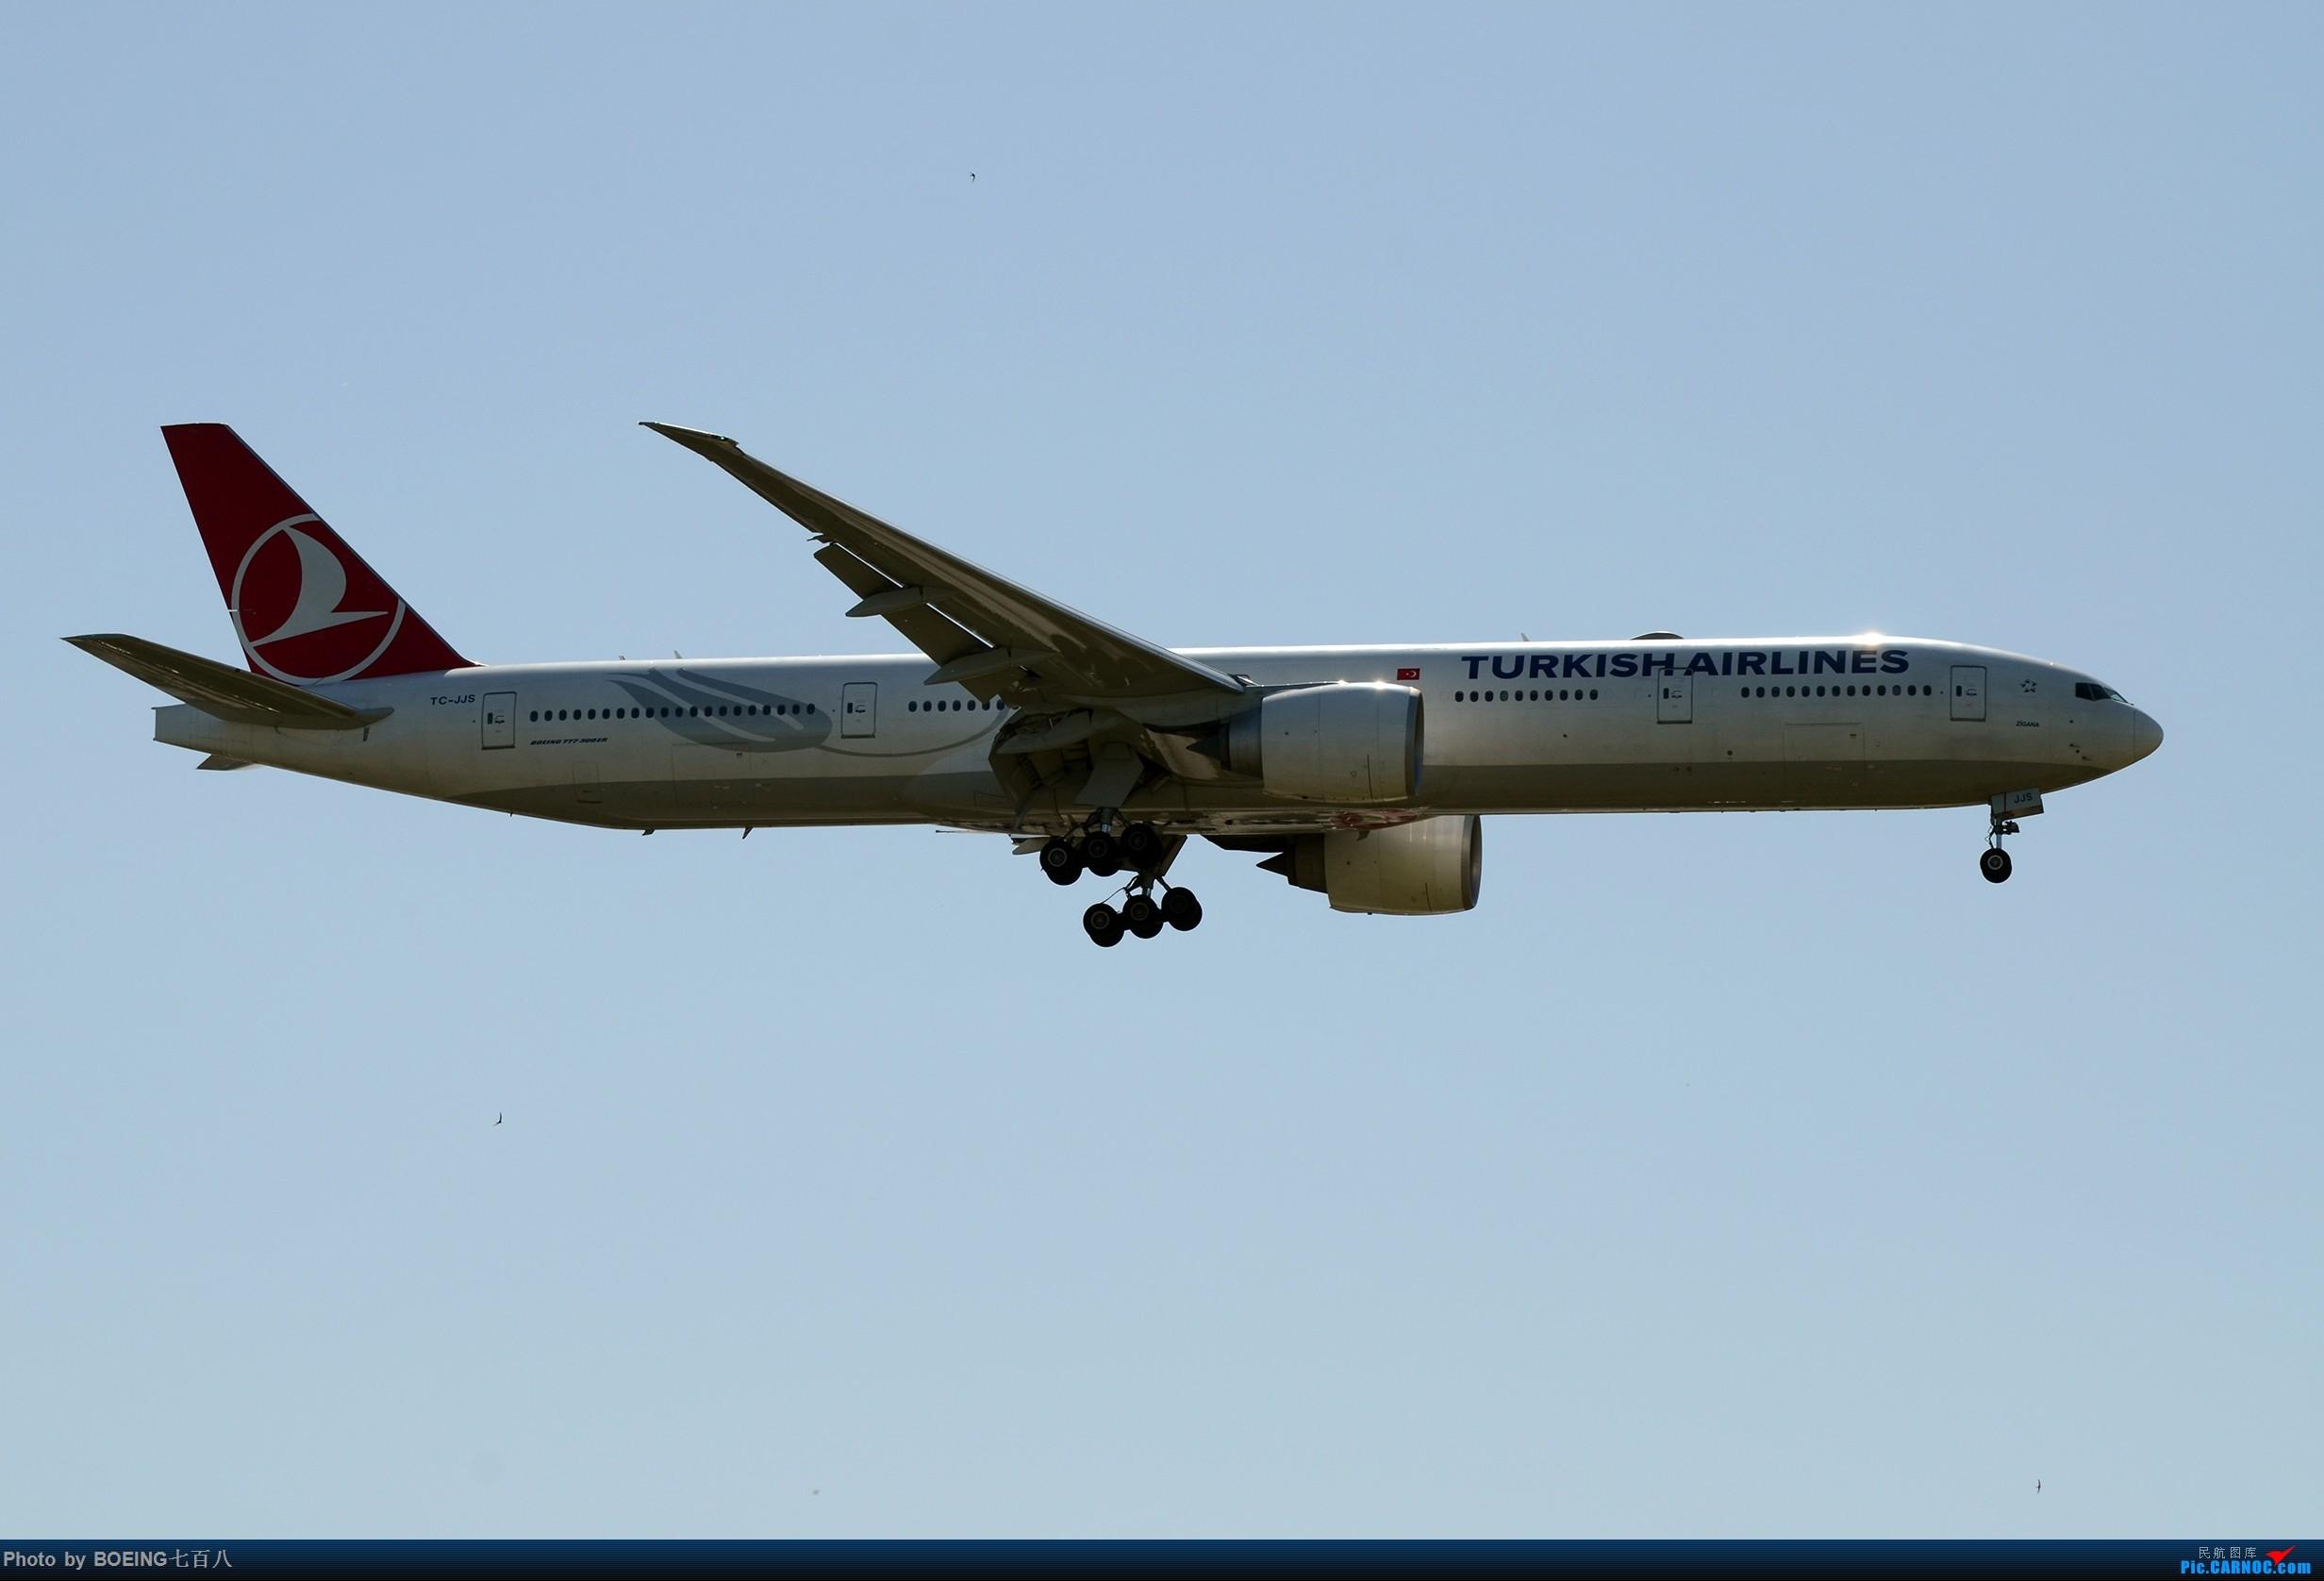 Re:[原创]好久没发作业了,5月13日的PEK BOEING 777-300ER TC-JJS 中国北京首都国际机场